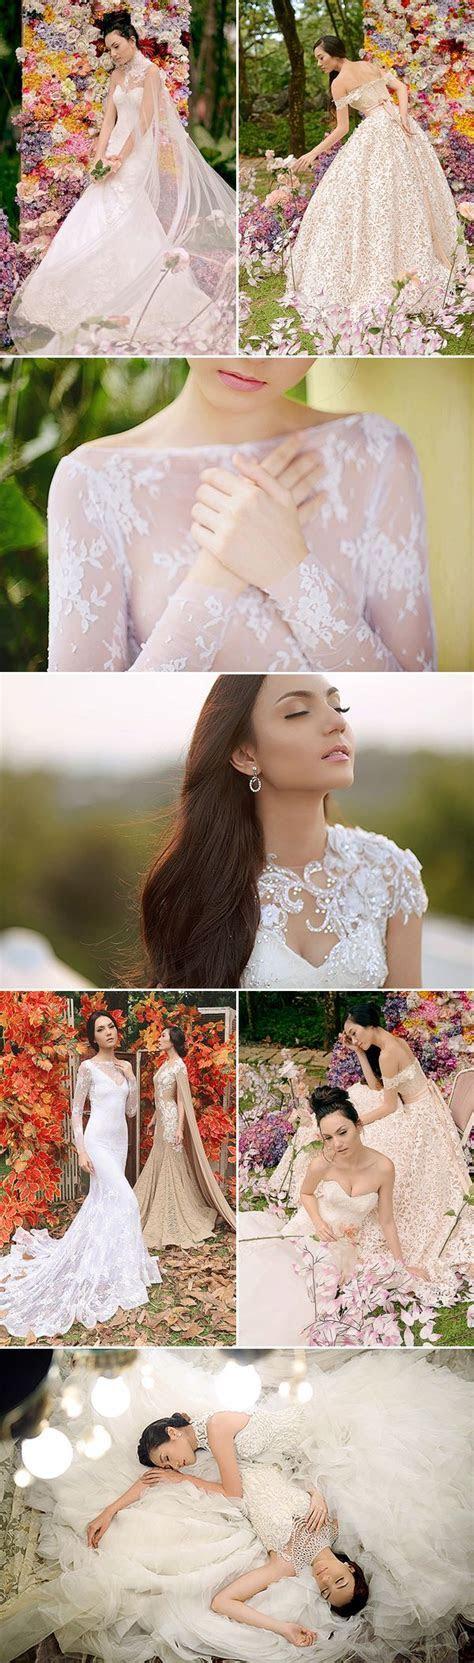 Top 10 Filipino Wedding Dress Designers We Love   WEDDING